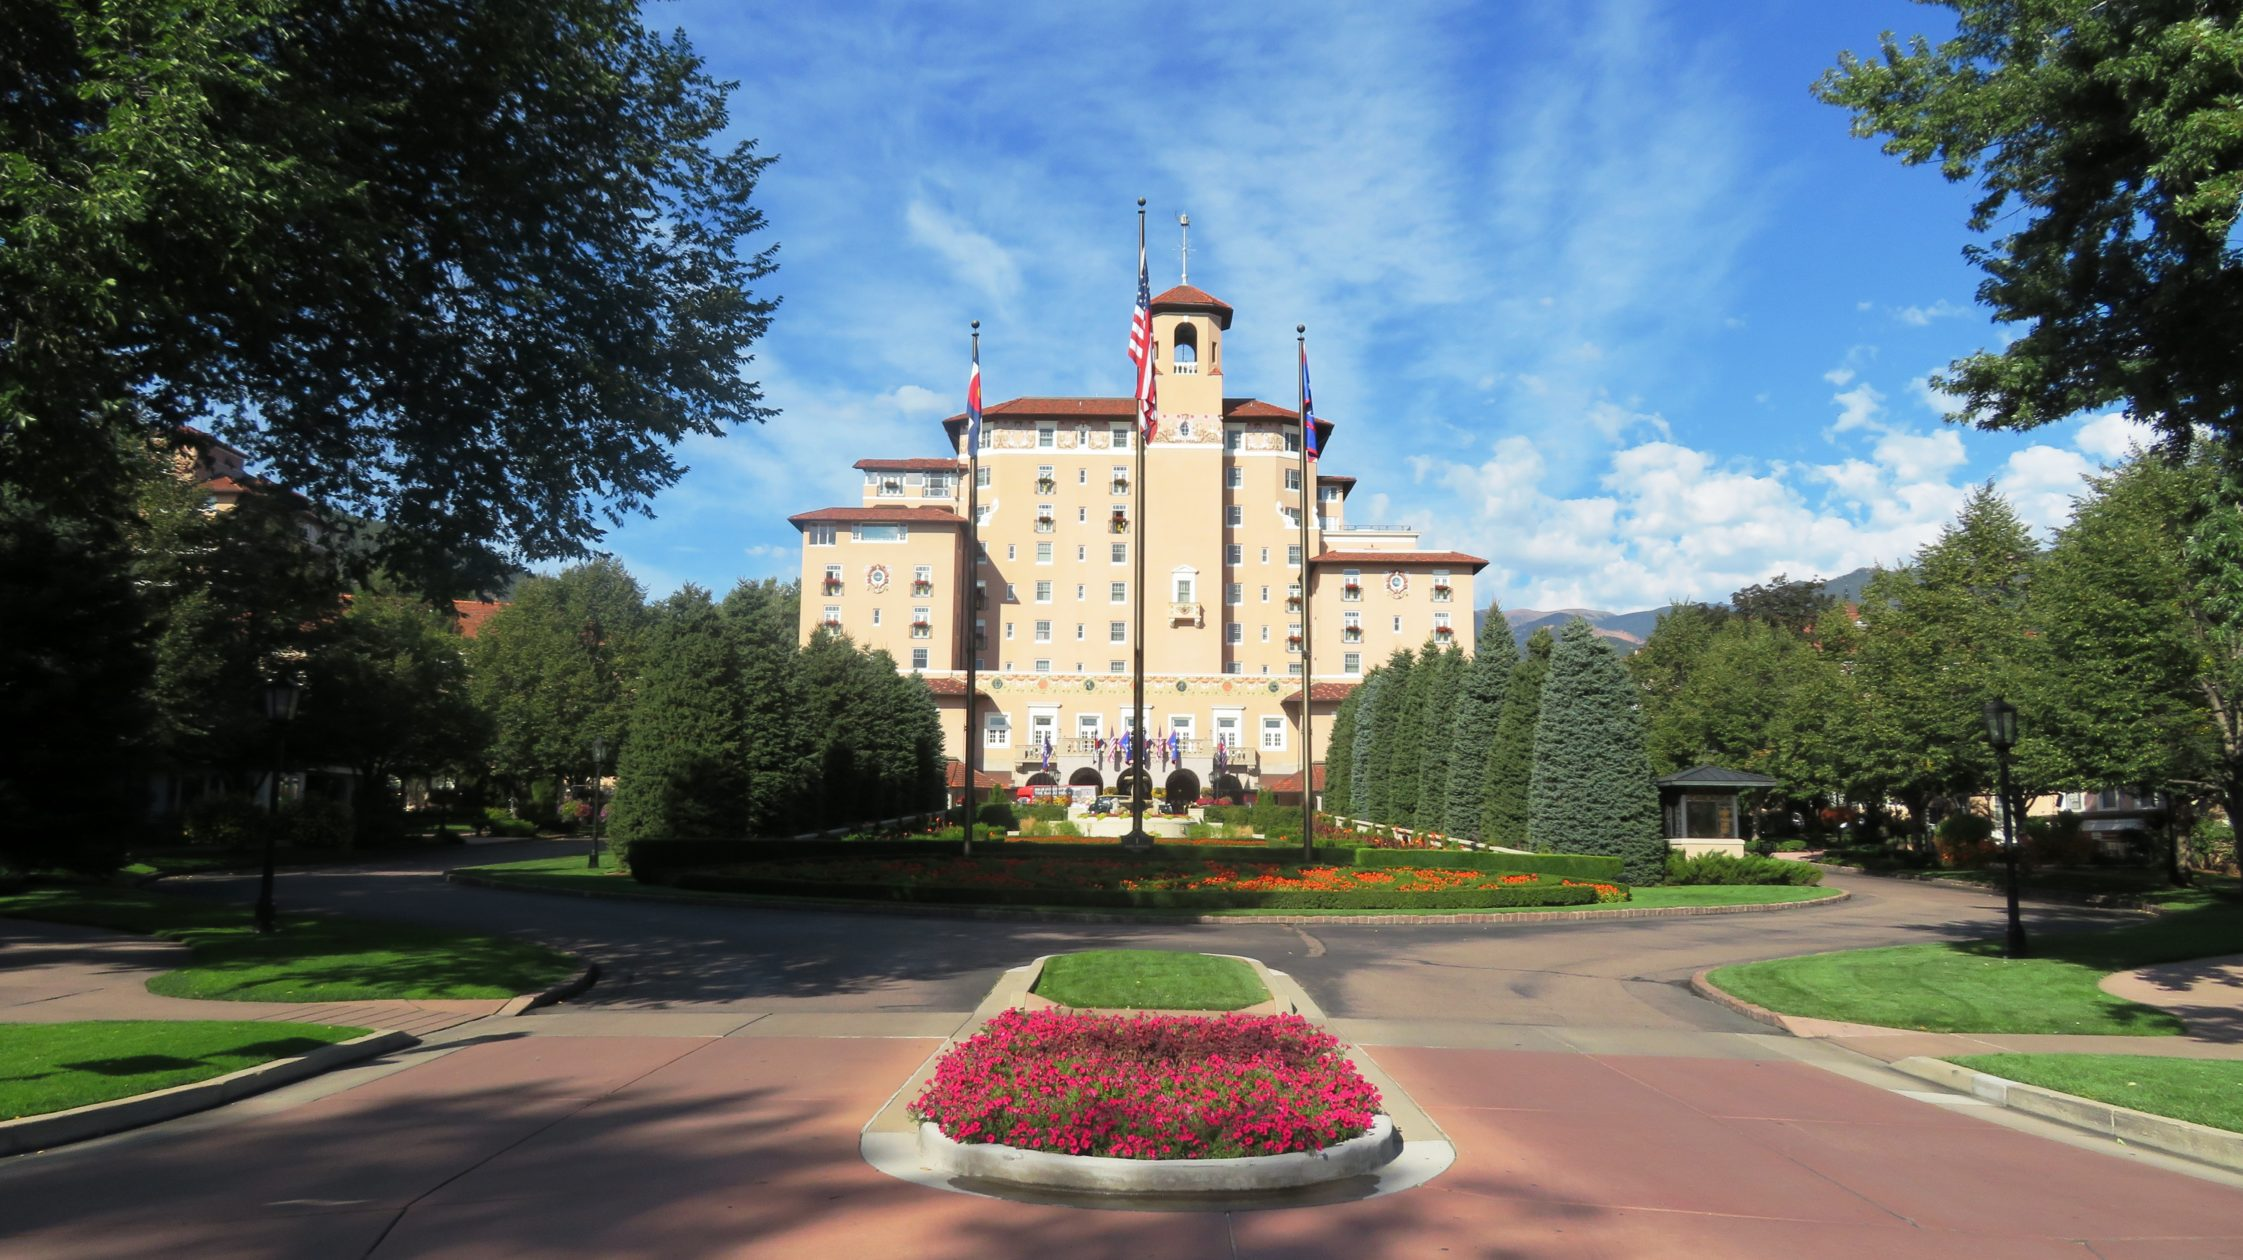 <em><strong>The Broadmoor</strong></em> Resort in Colorado Springs, Colorado